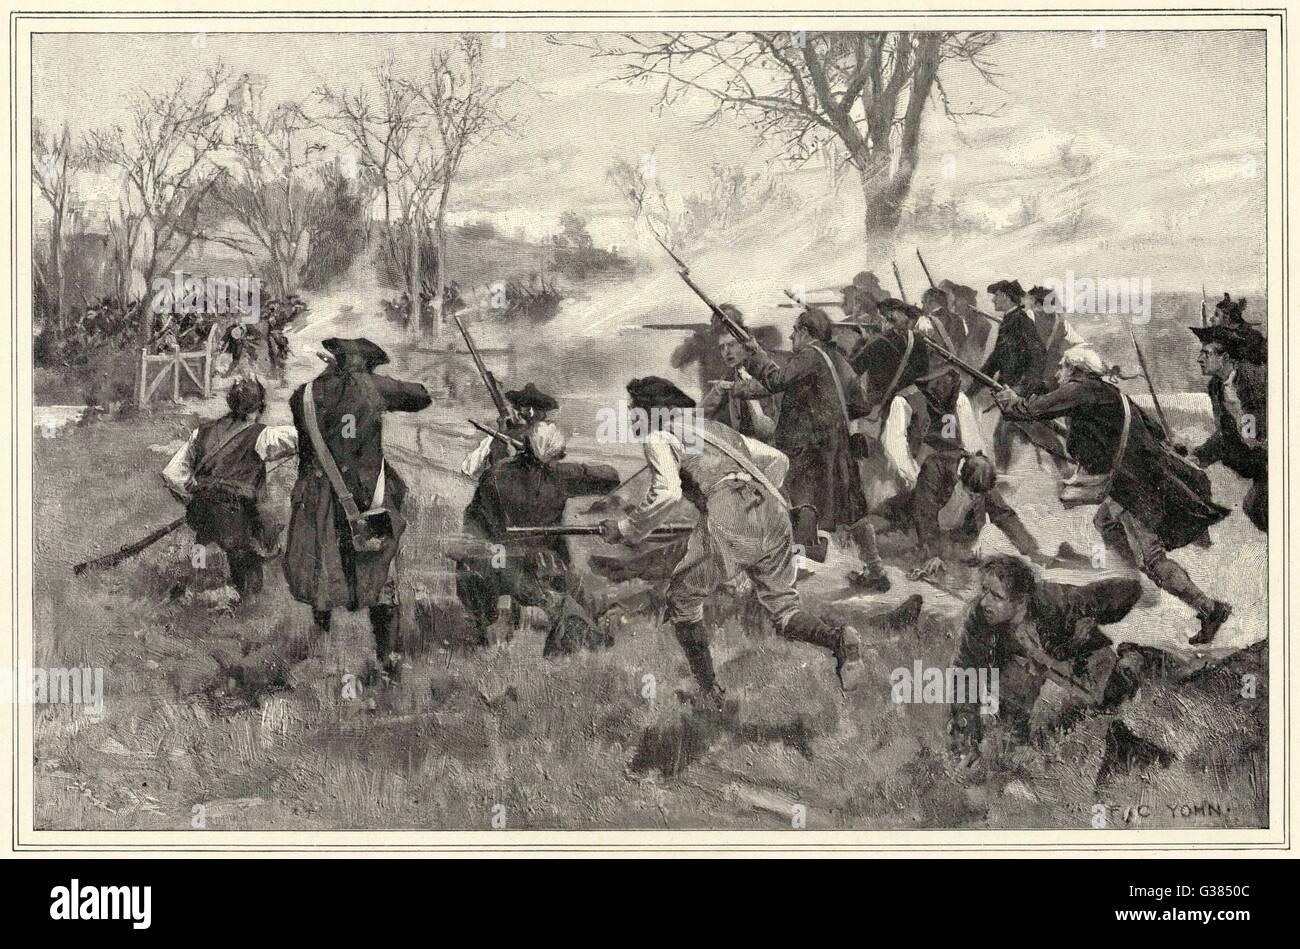 The Fight at Concord Bridge          Date: 19 April 1775 - Stock Image